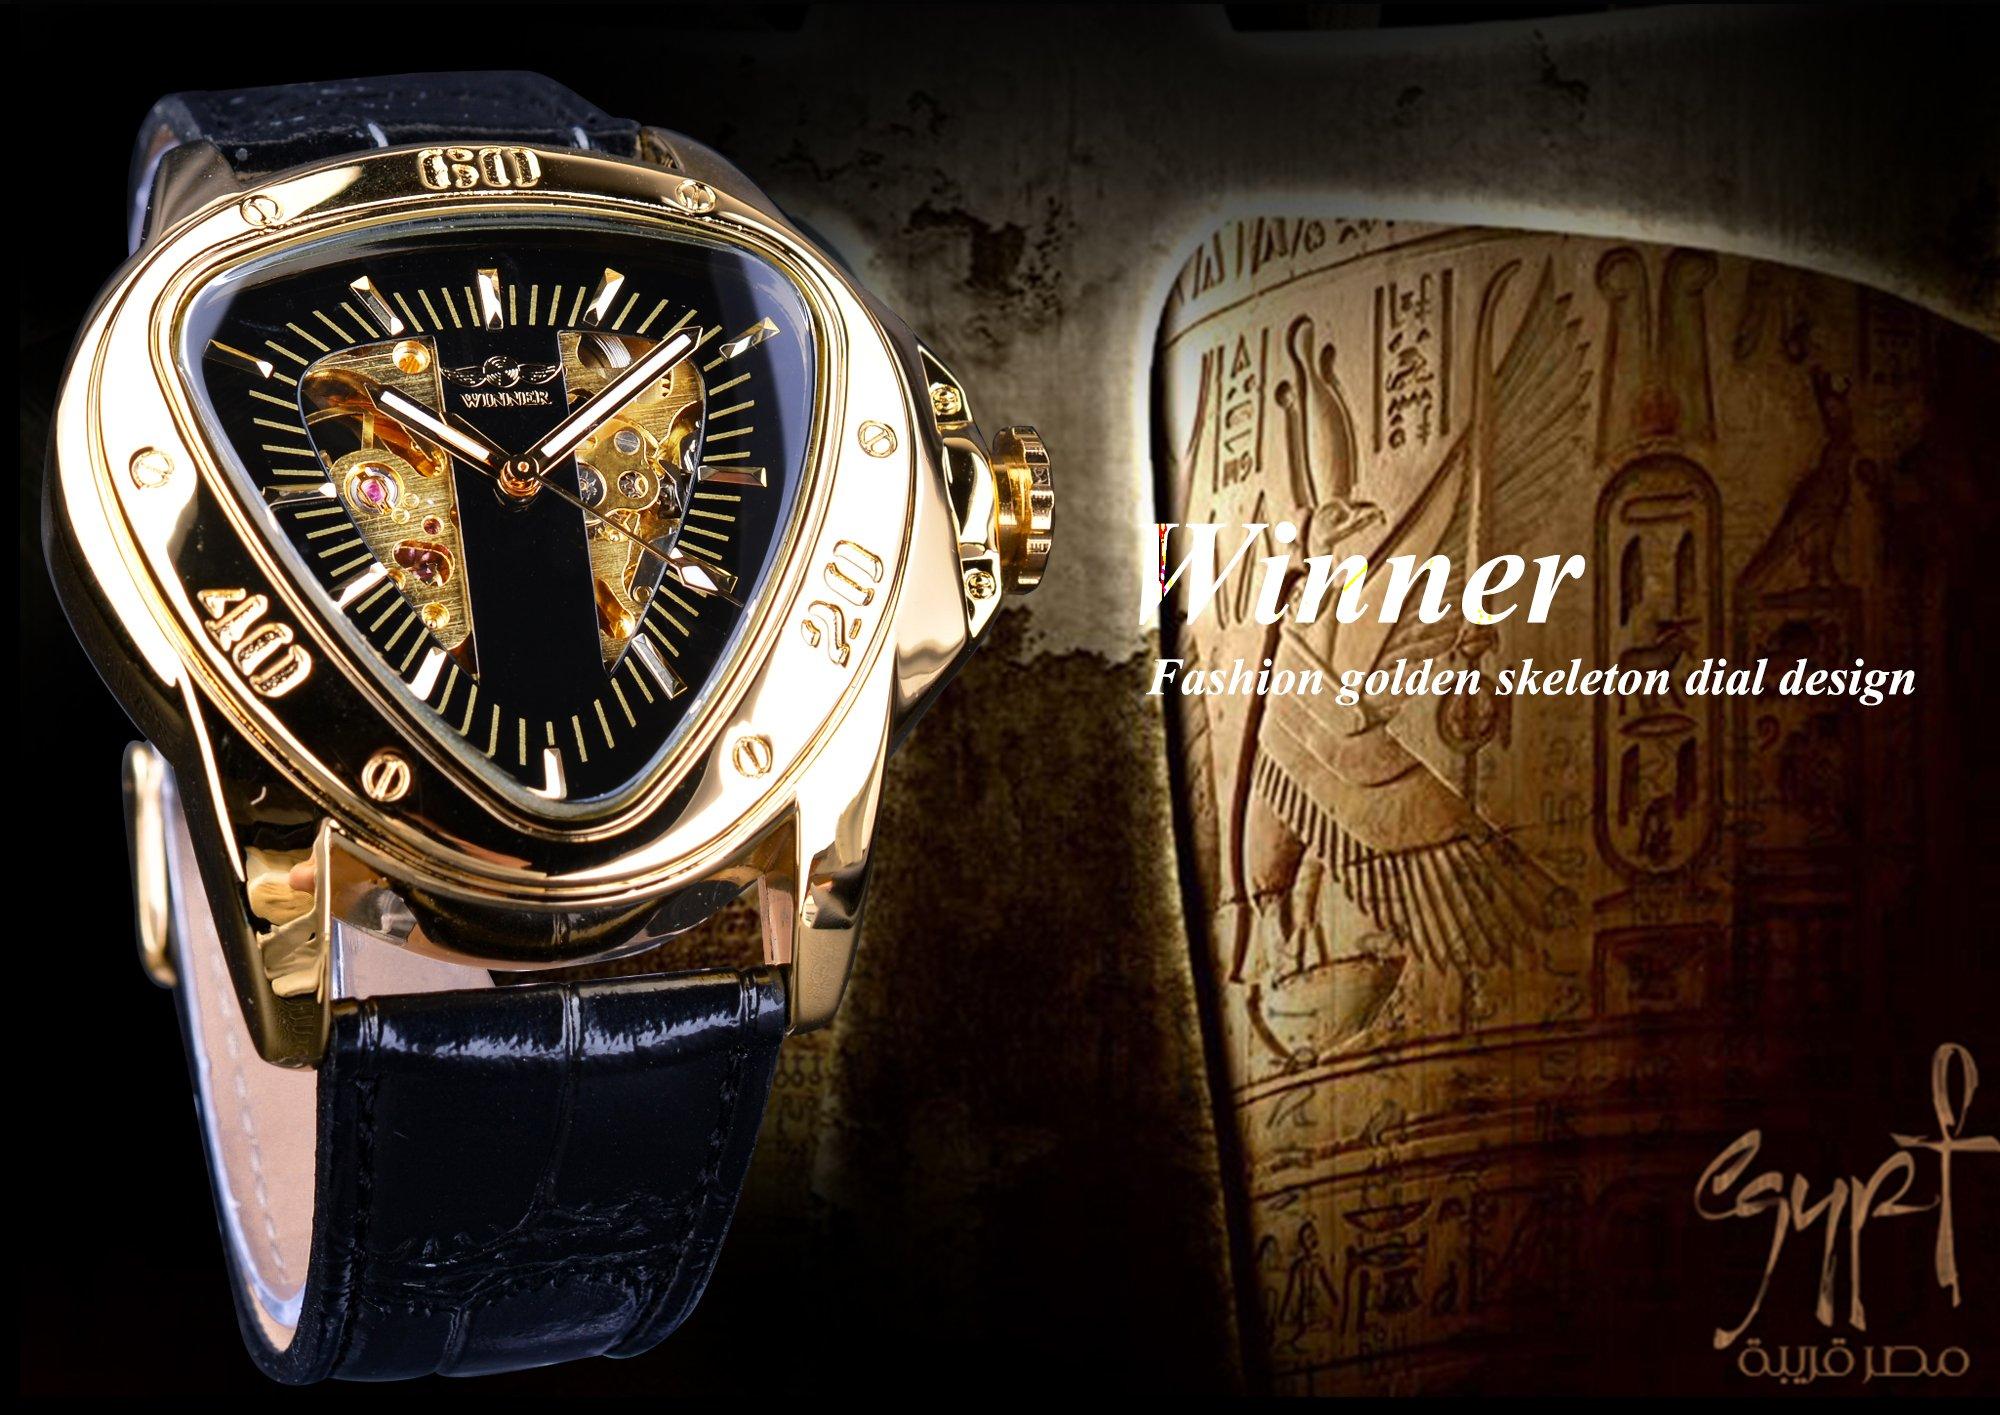 Winner Fashion Mechanical Wrist Watch Triangle Racing Dial Golden Skeleton Dial 5